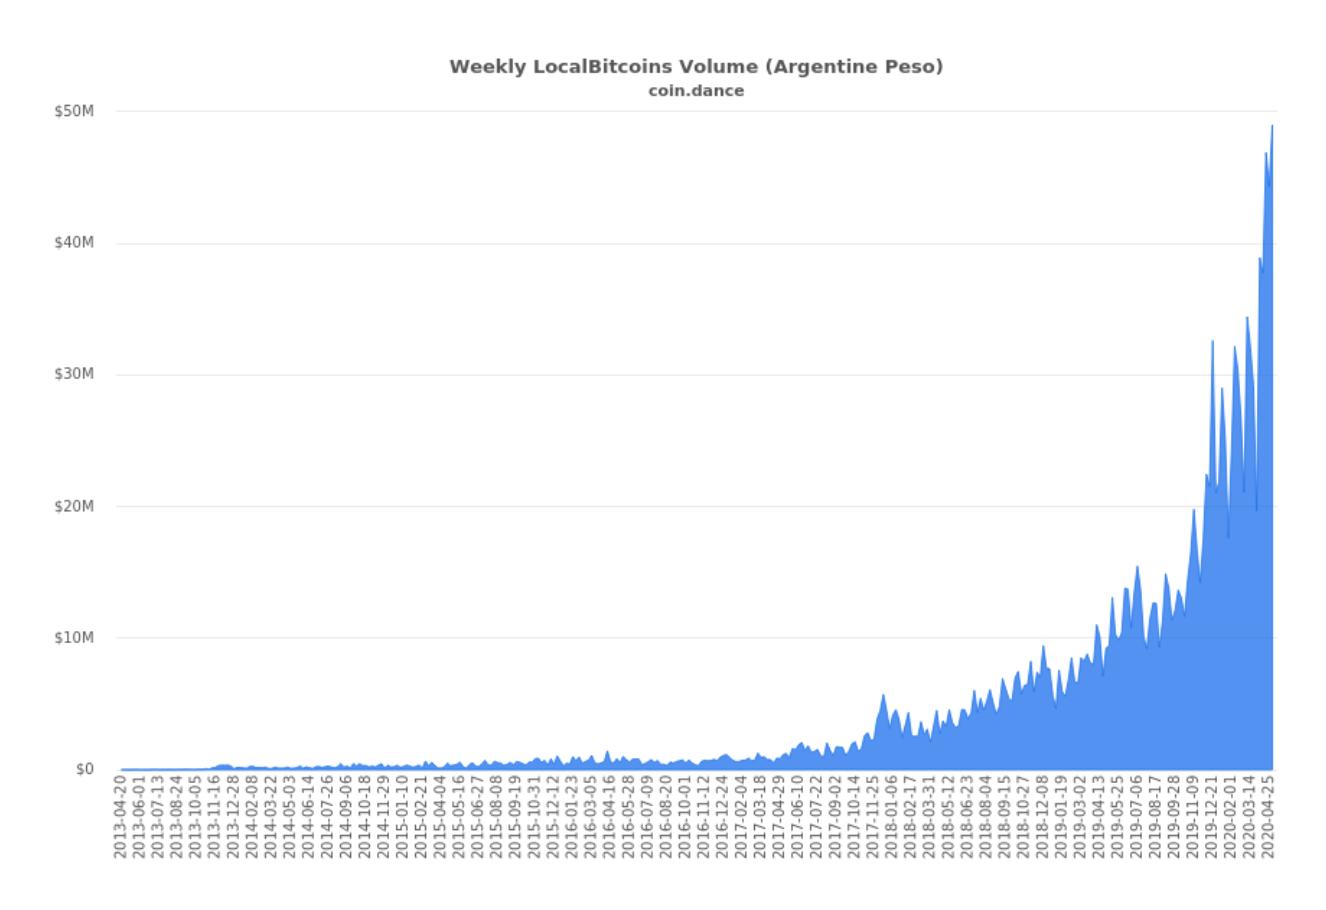 Bitcoin transaction volume